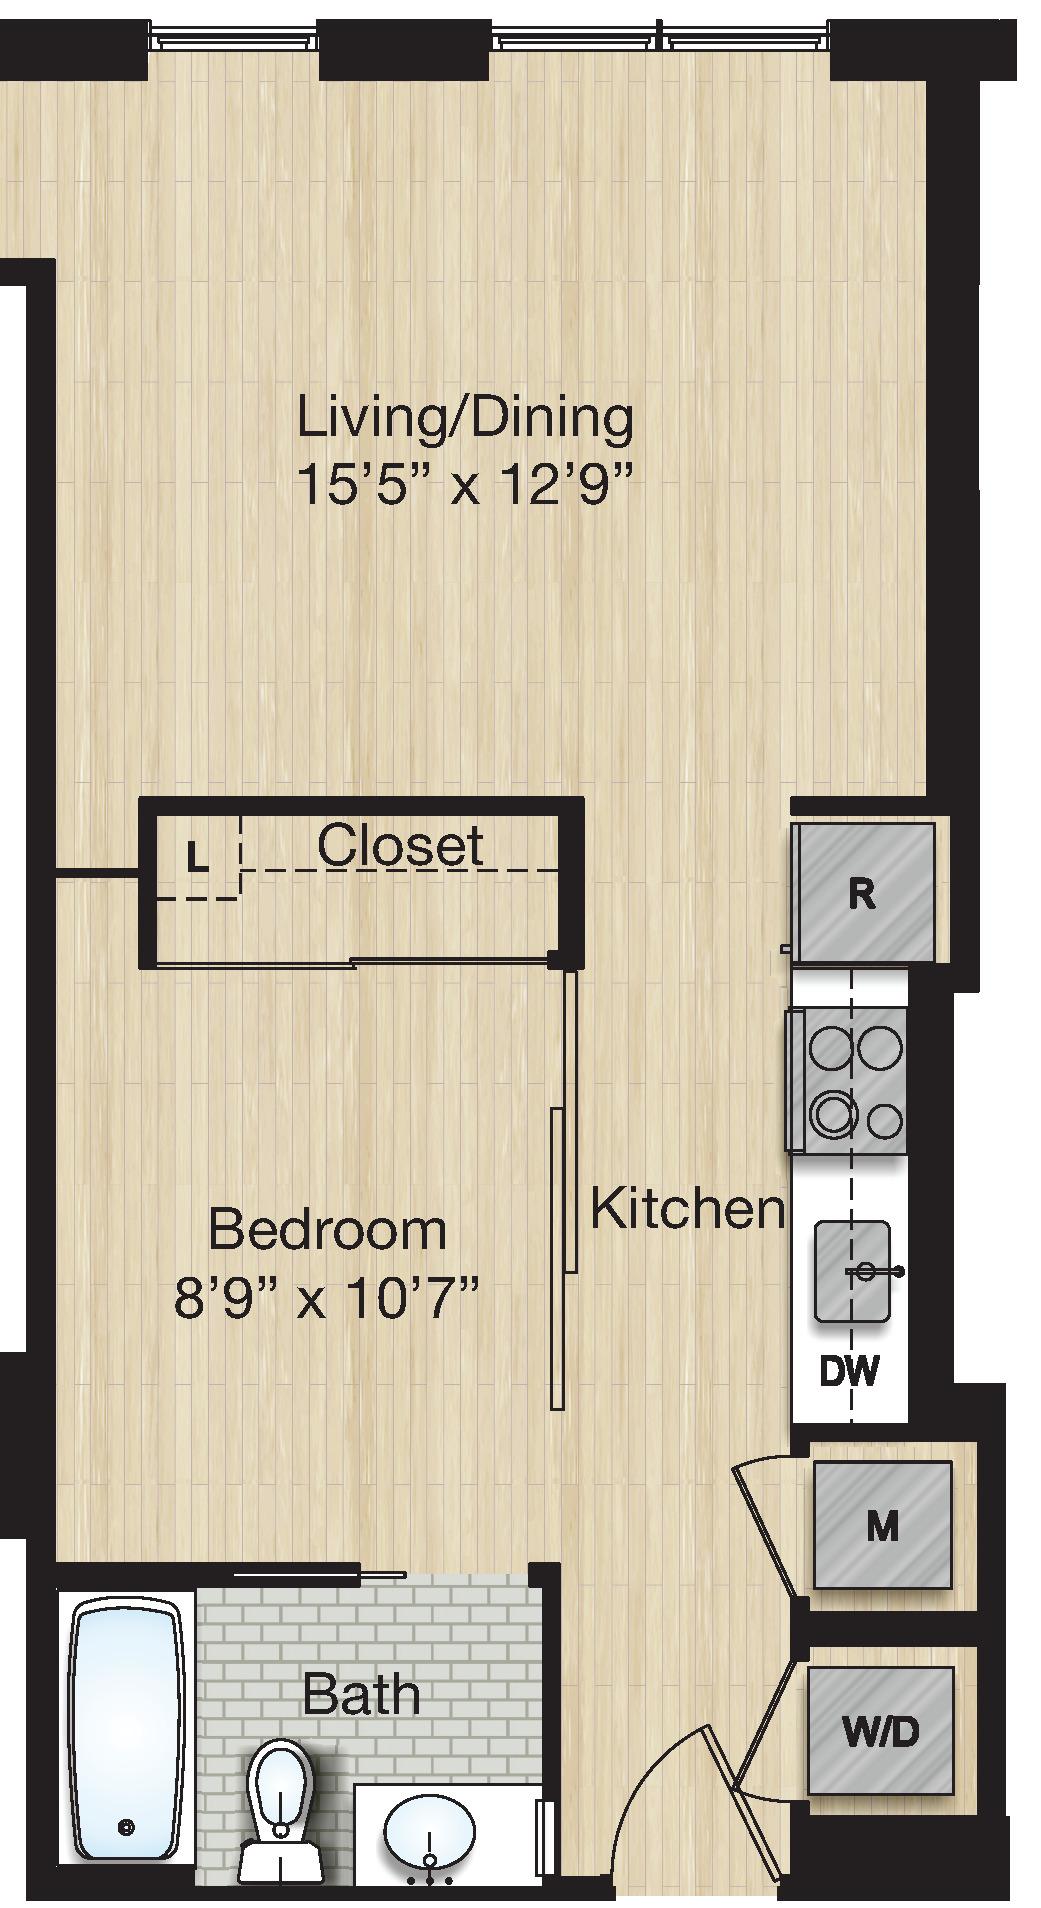 Apartment 0415 floorplan